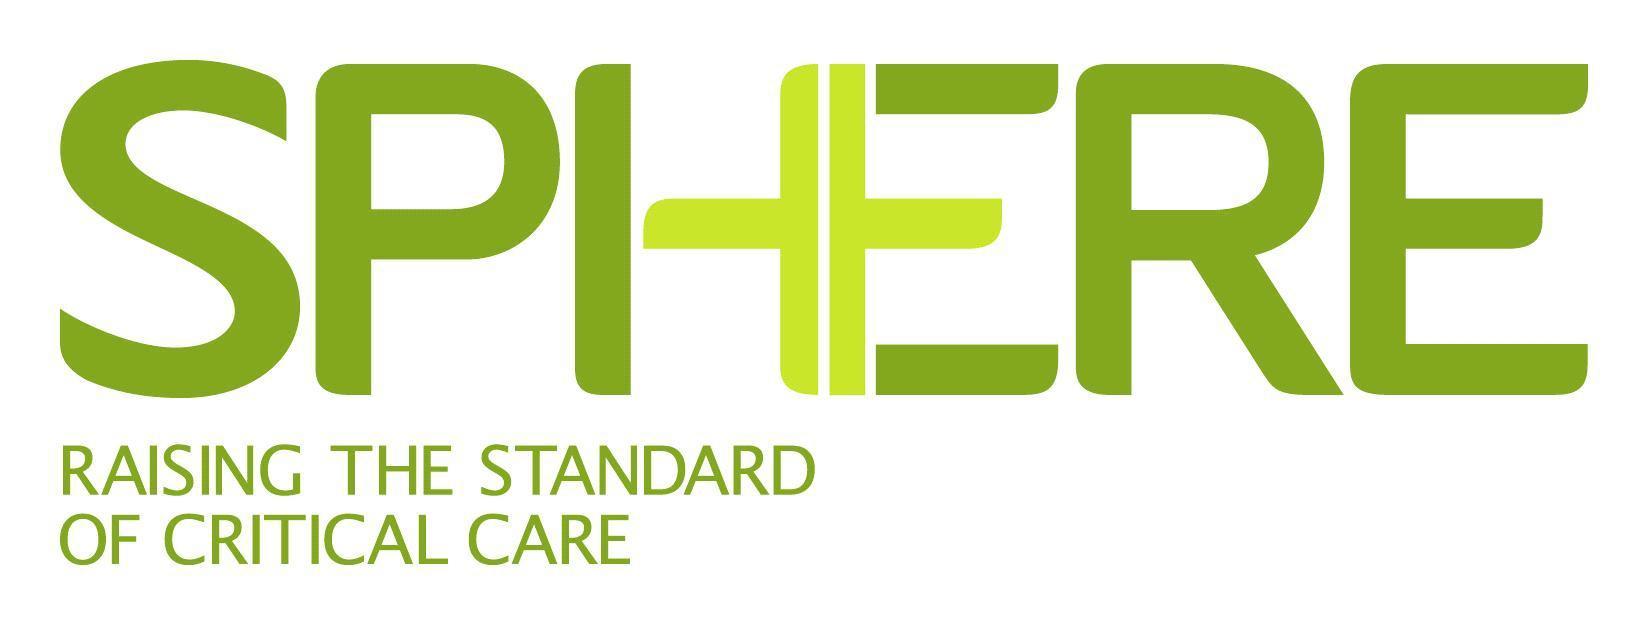 Sphere Medical Holding PLC logo